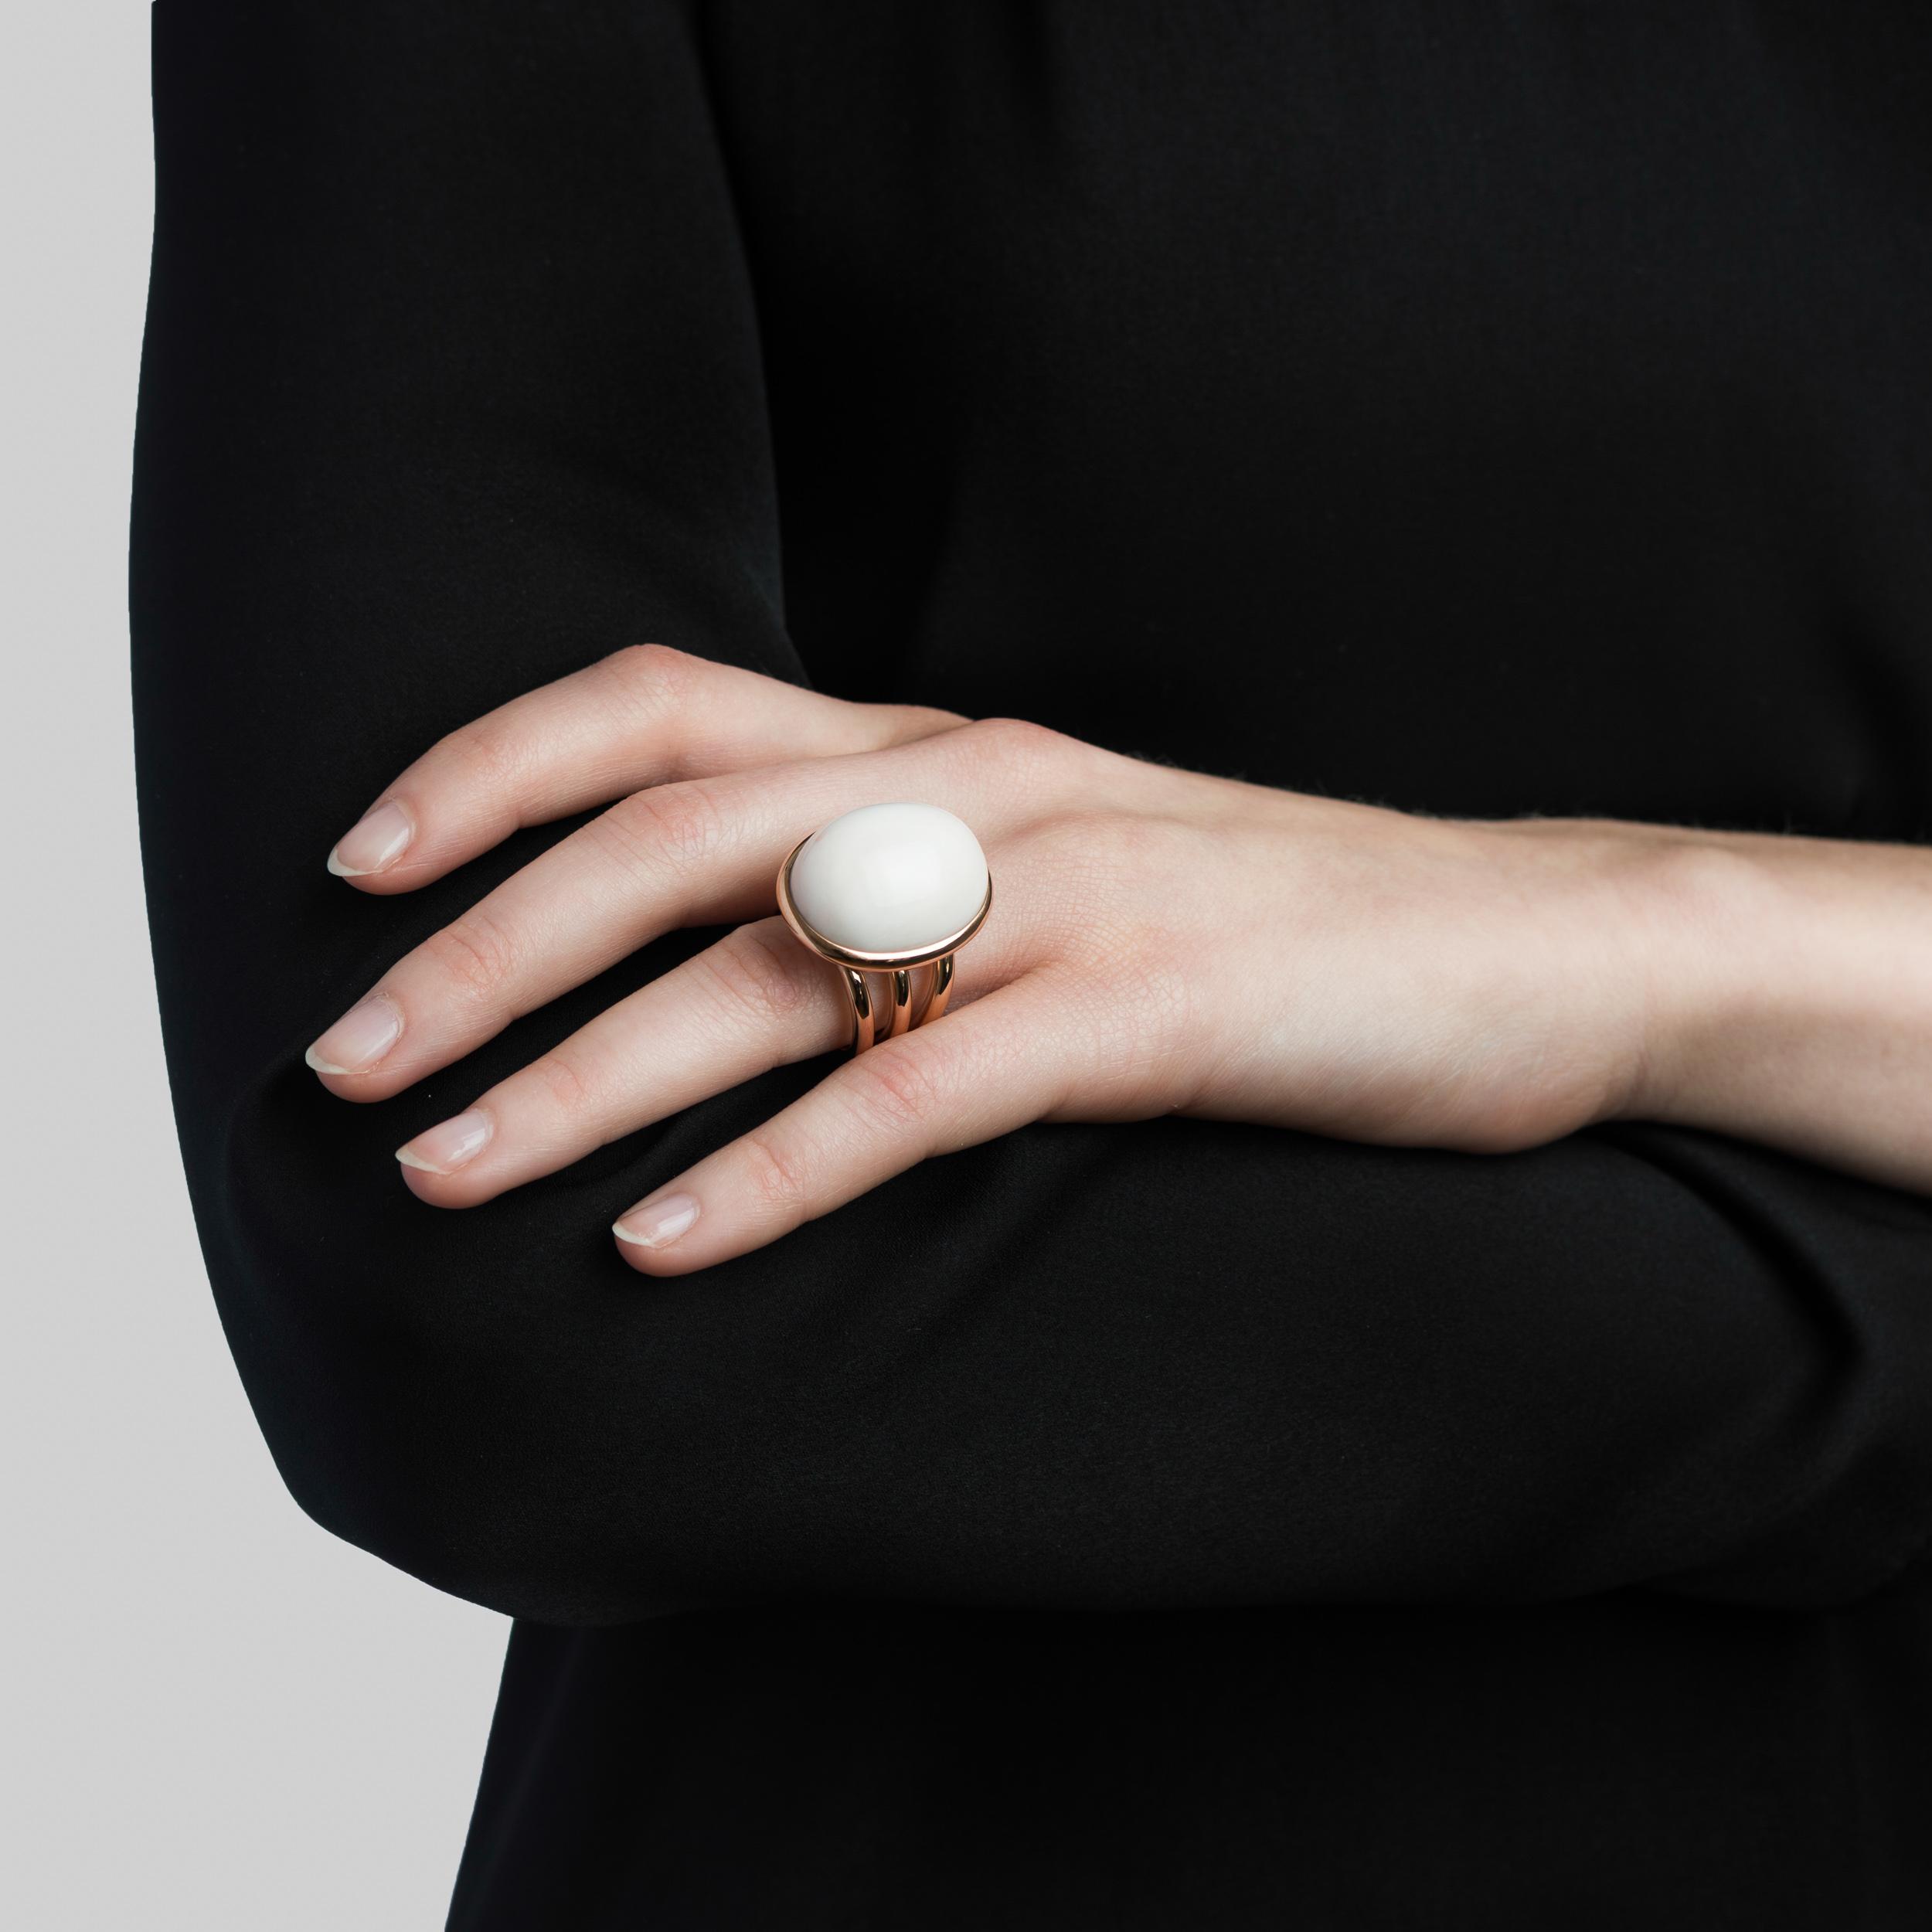 Ring am Model7